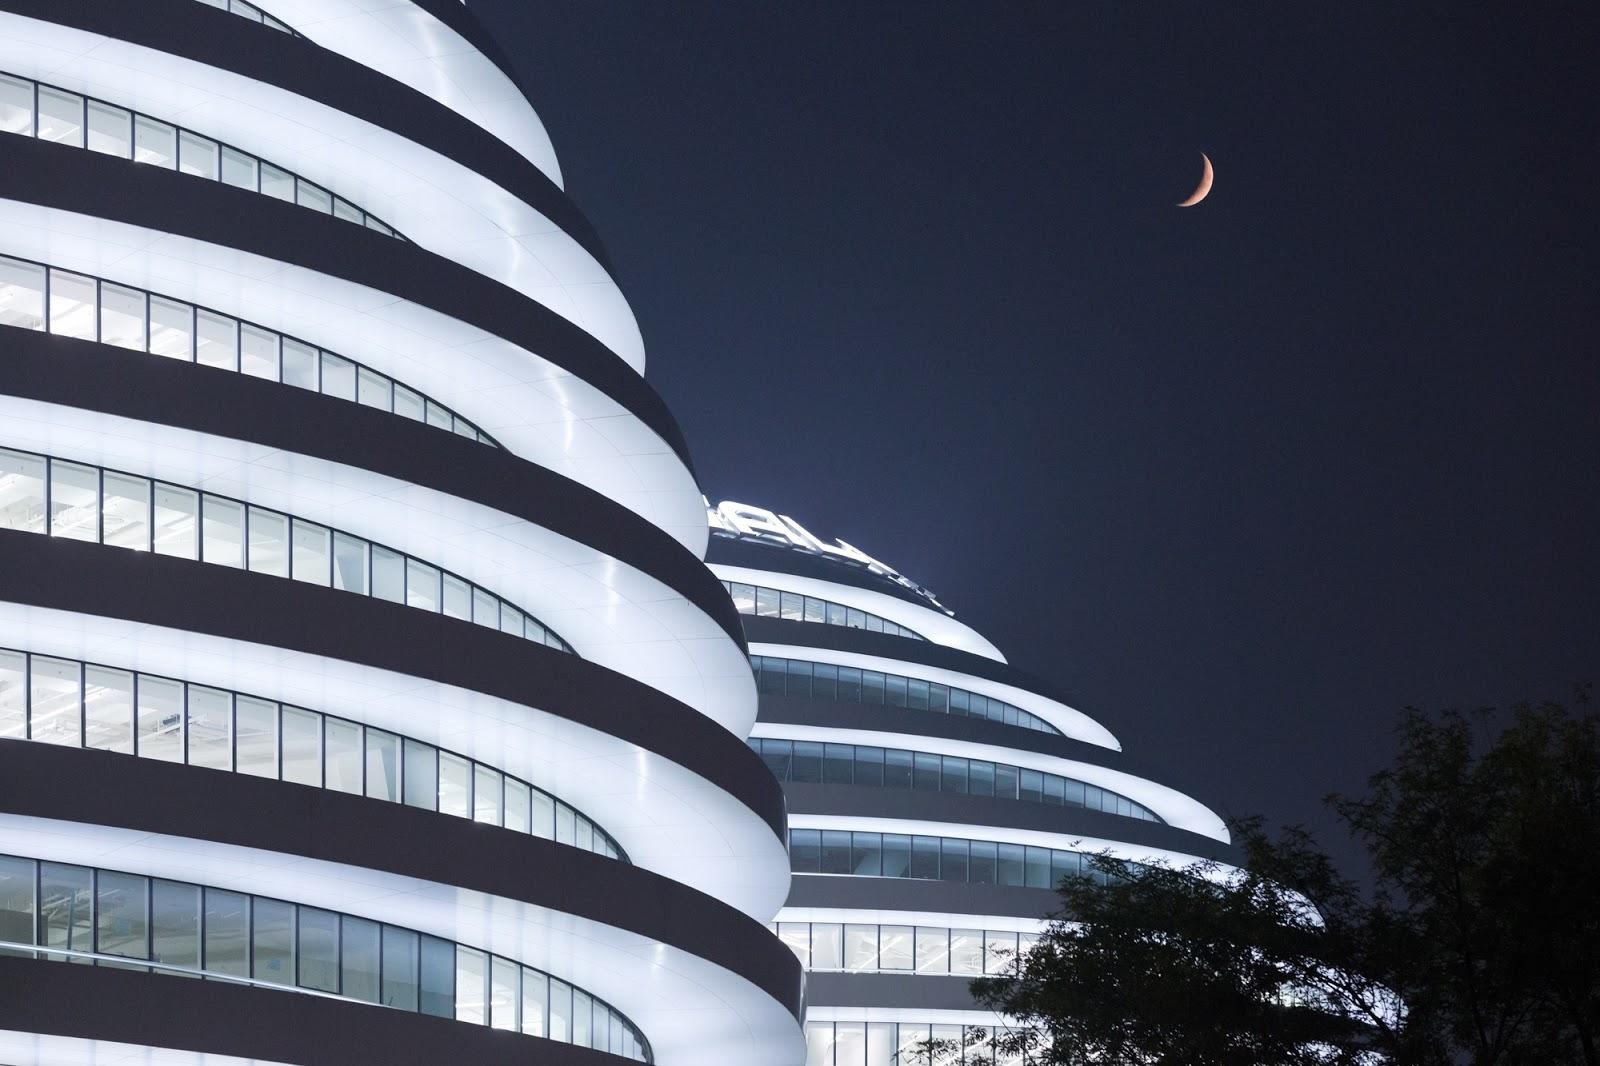 Galaxy soho de zaha hadid blog arquitectura y dise o for Arquitectura zaha hadid